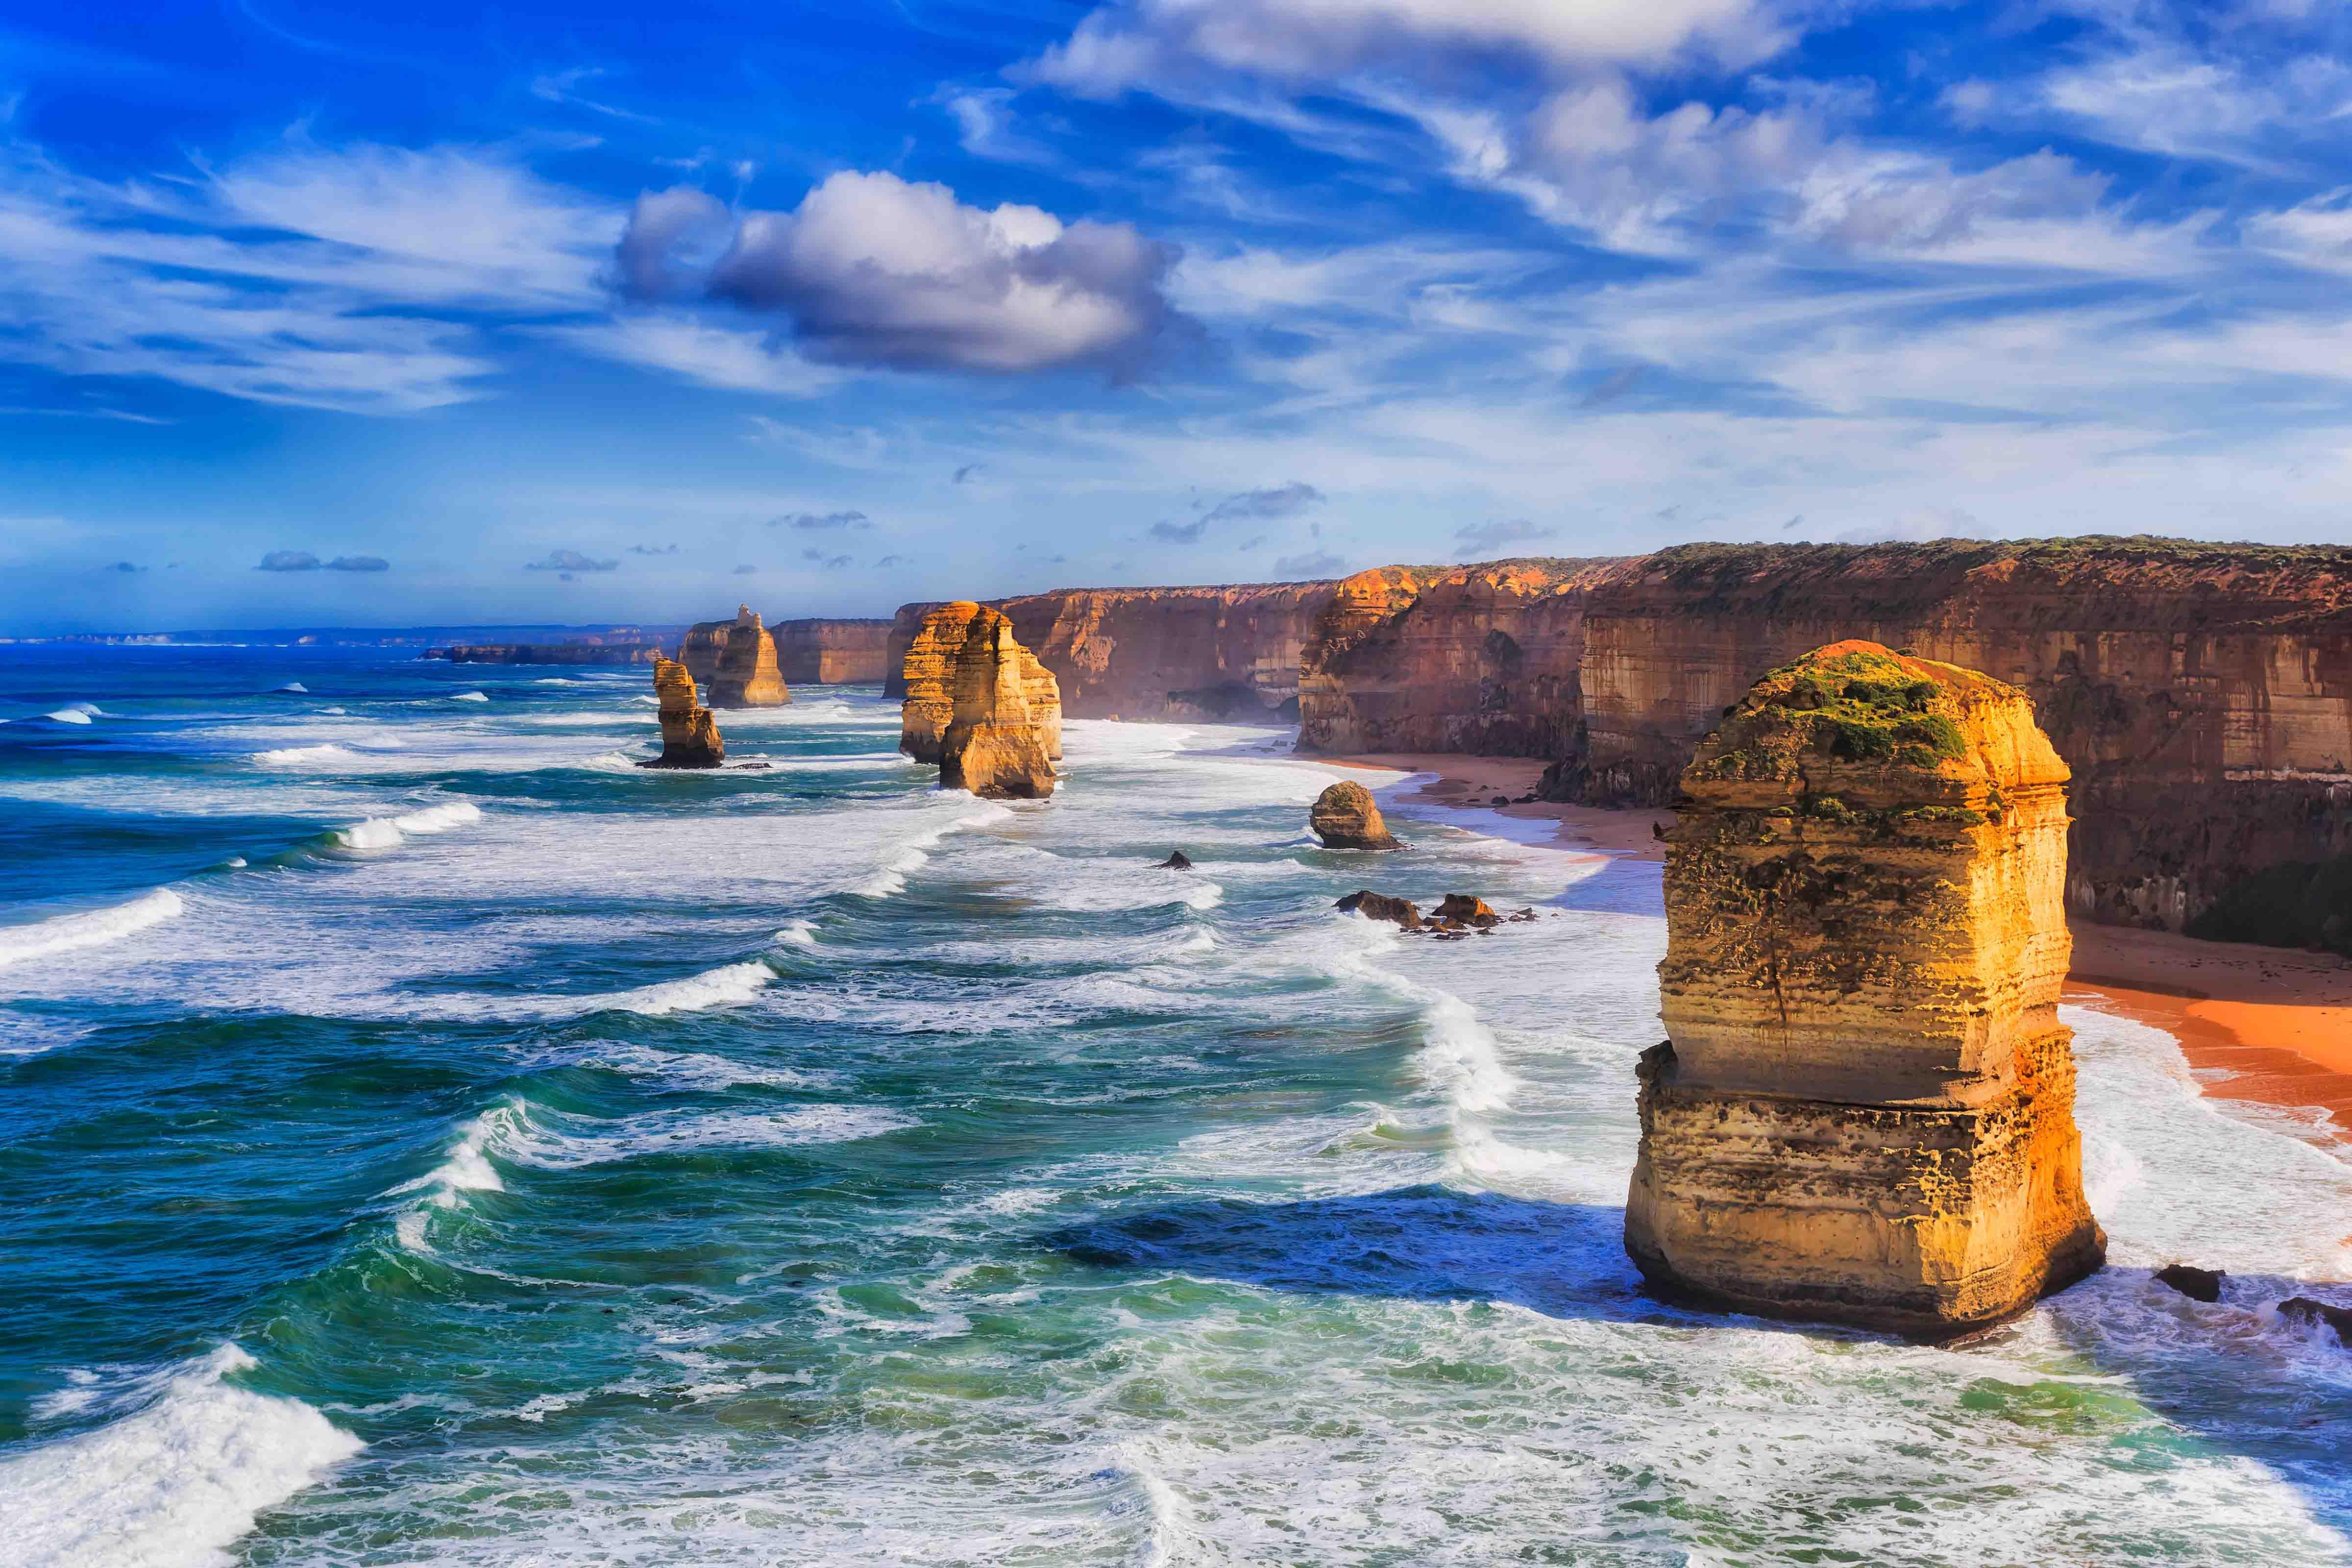 F2001053SSK_779952475澳大利亚十二使徒岩组 Group of twelve apostles.jpg